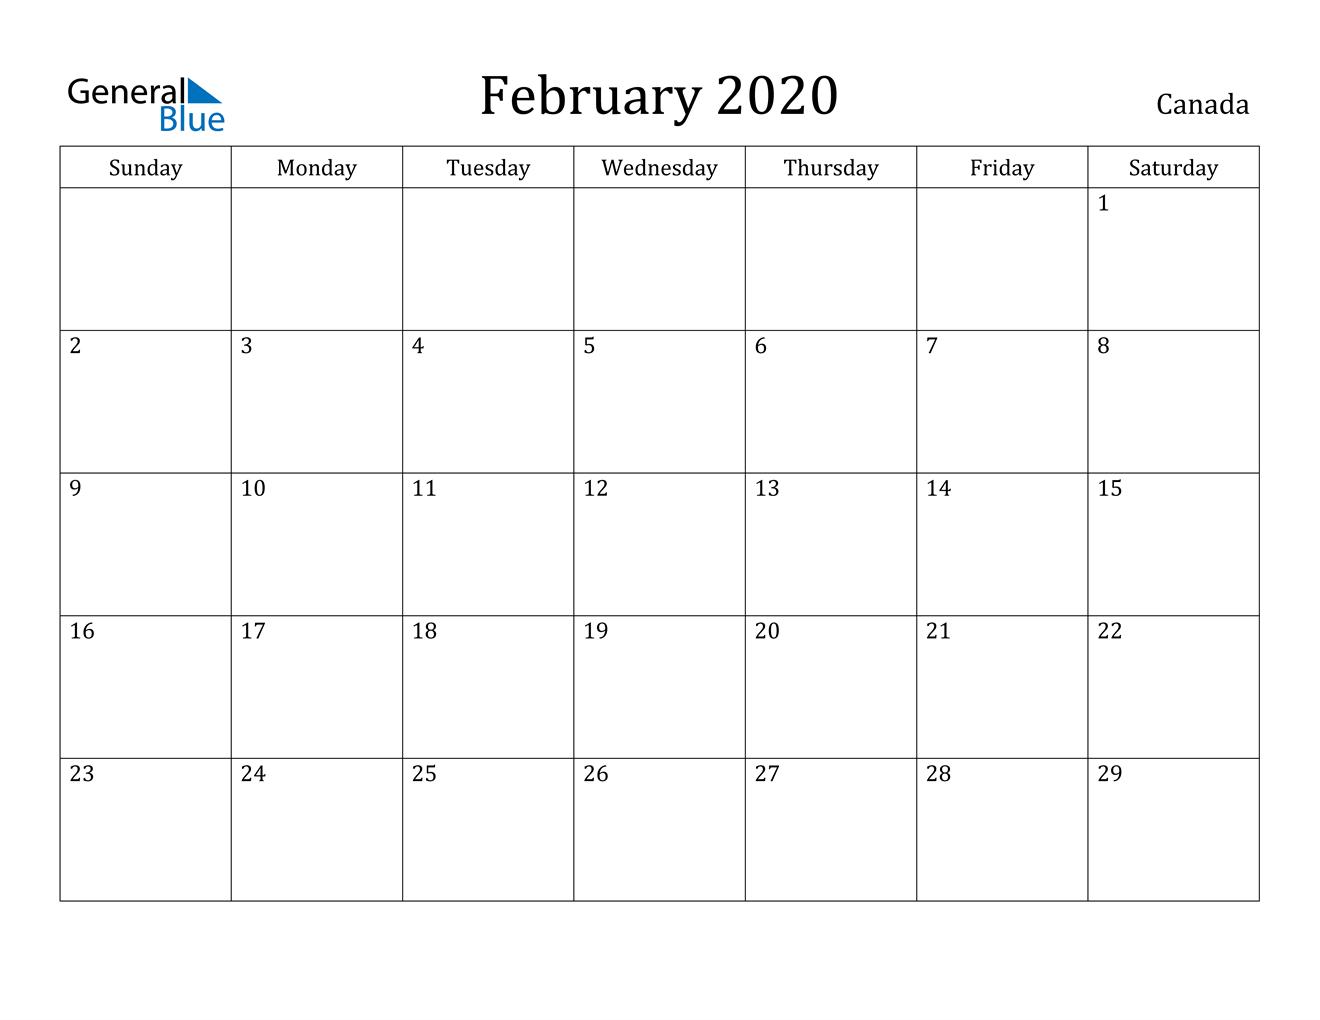 February 2020 Calendar - Canada